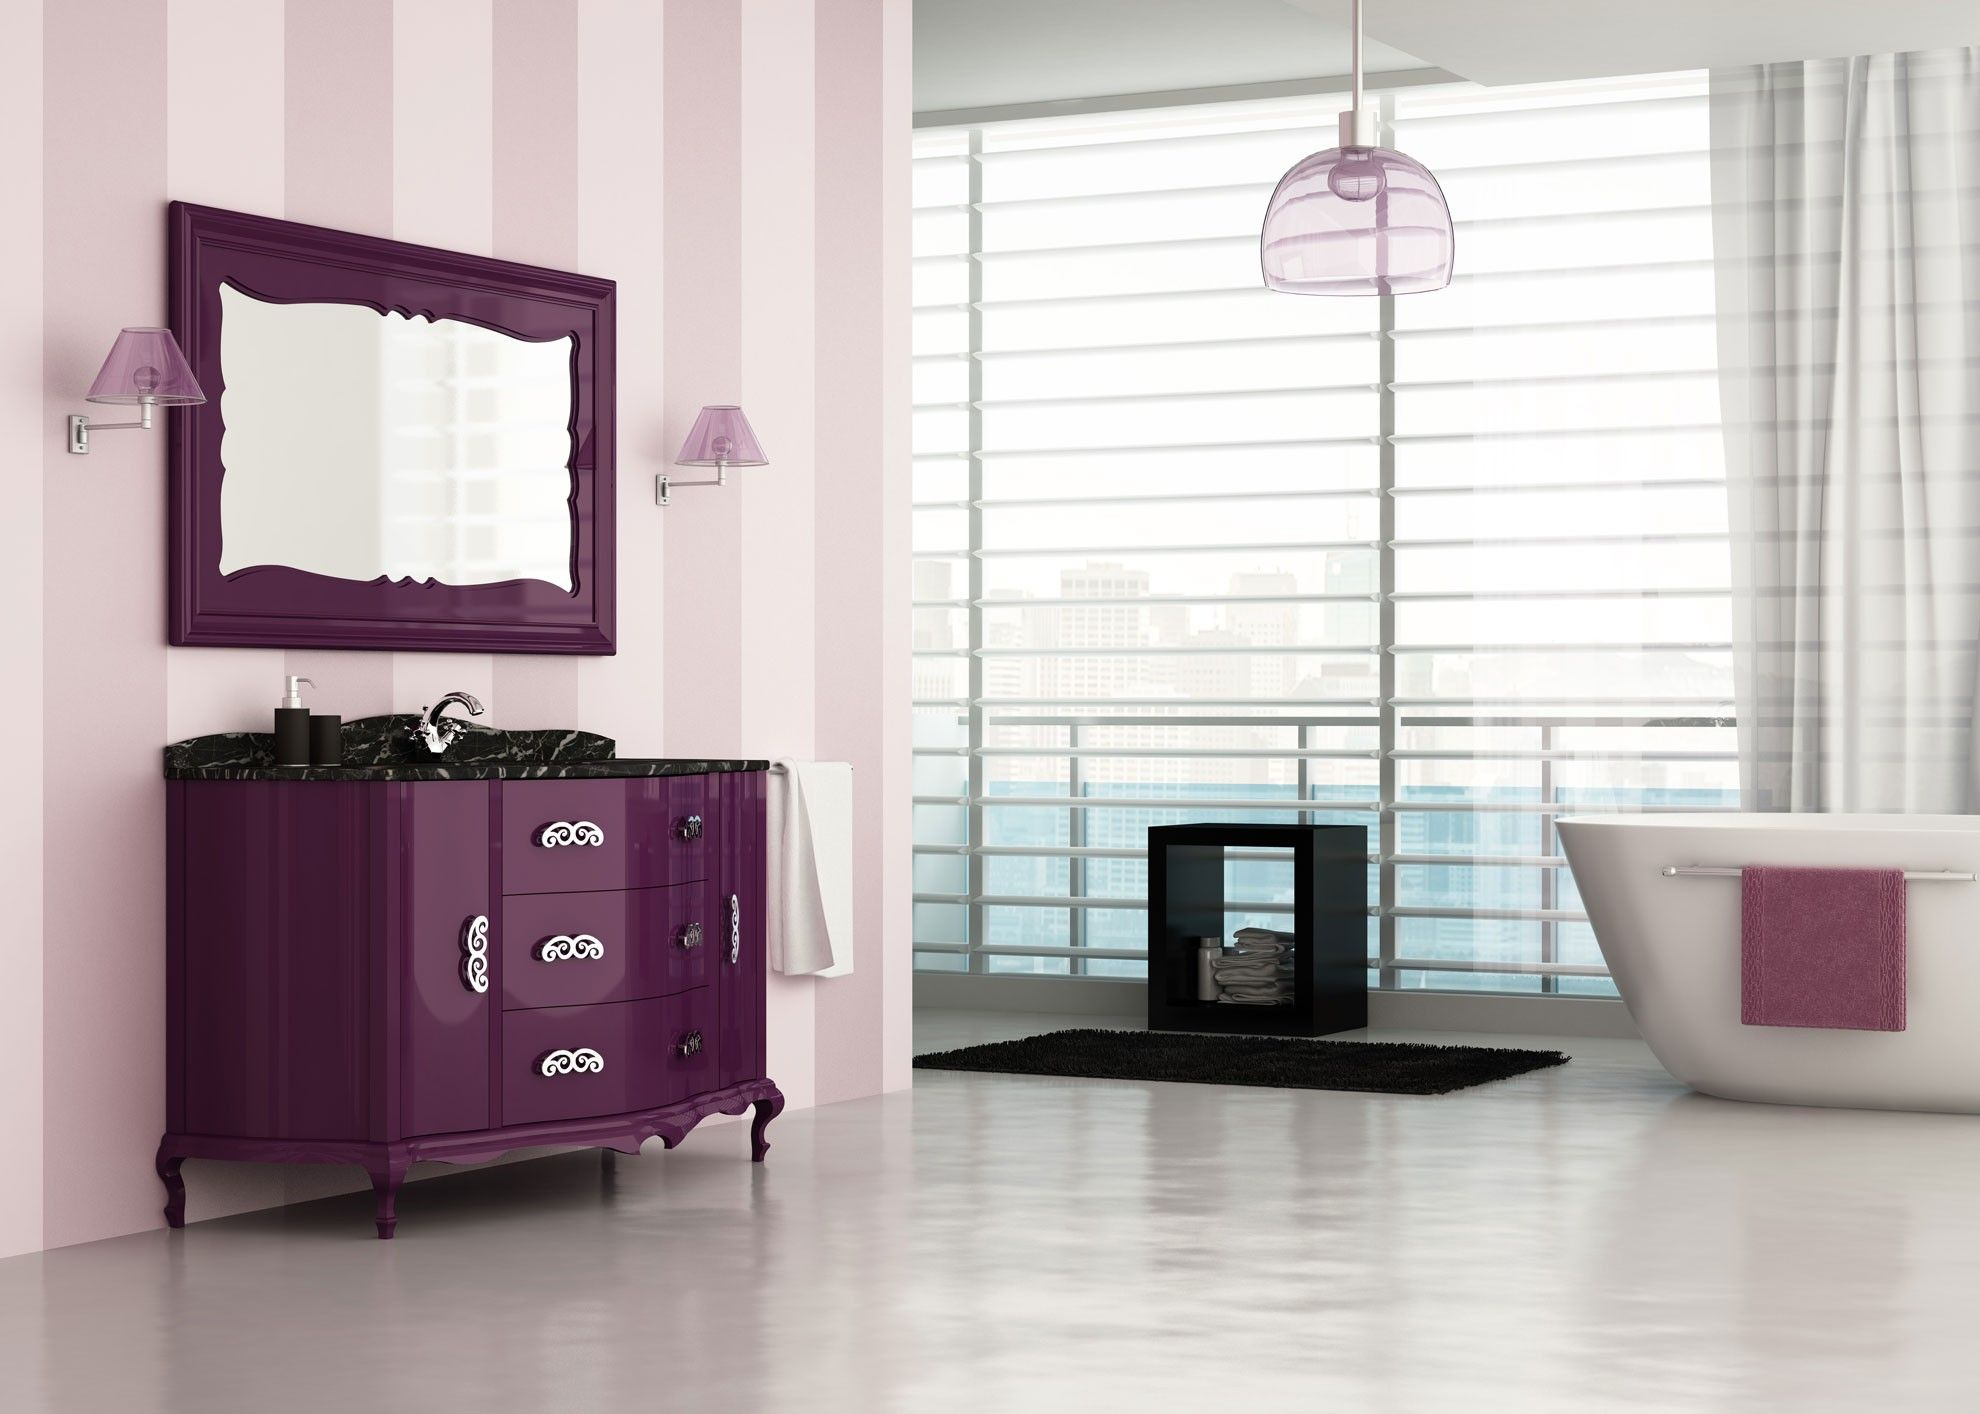 Mueble de ba o de lujo 150 cm roma muebles de lujo Muebles de bano 150 cm